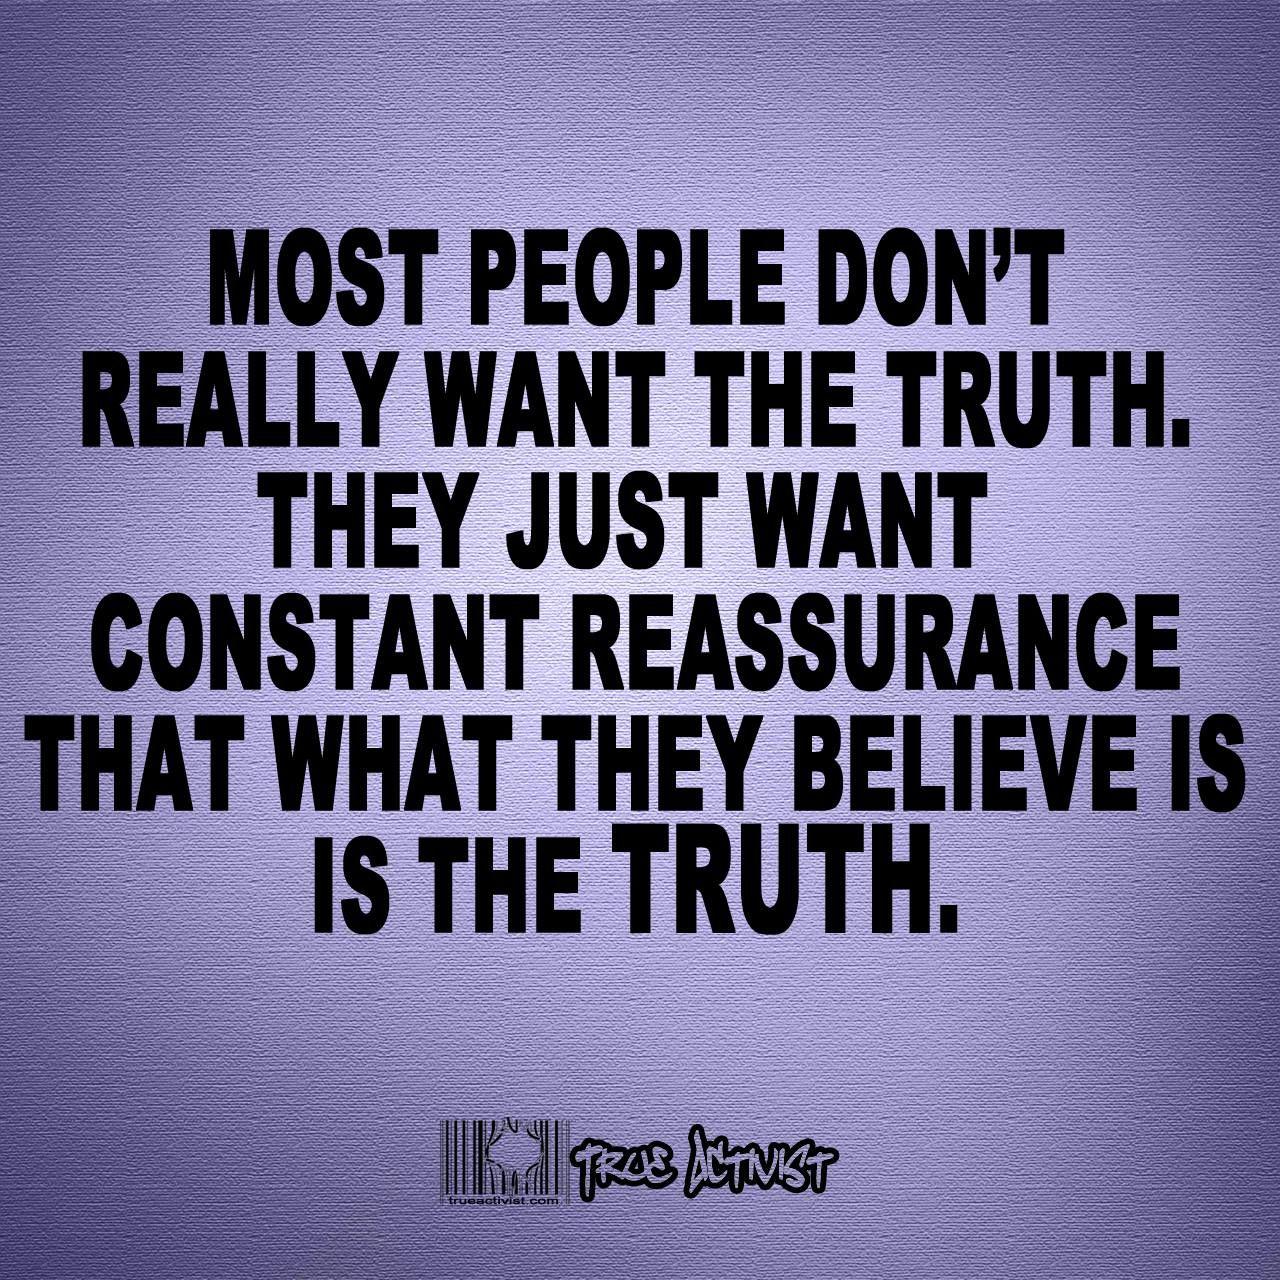 Confirmation bias..